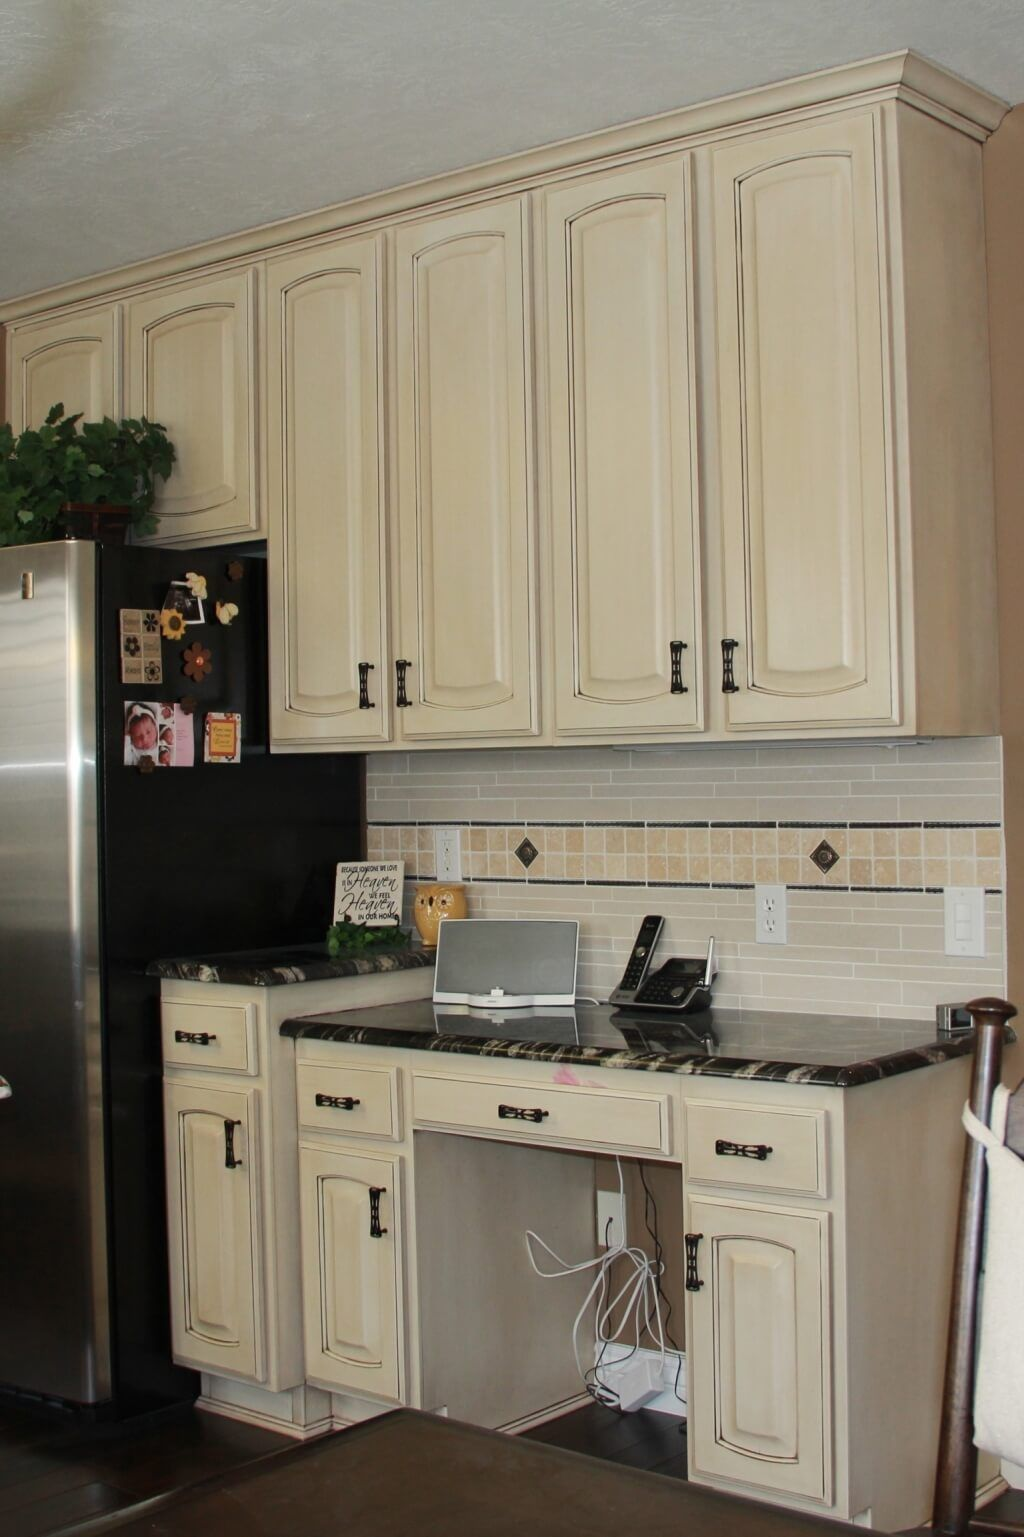 Stunning Off White Kitchen Cabinets Design | White kitchen ...